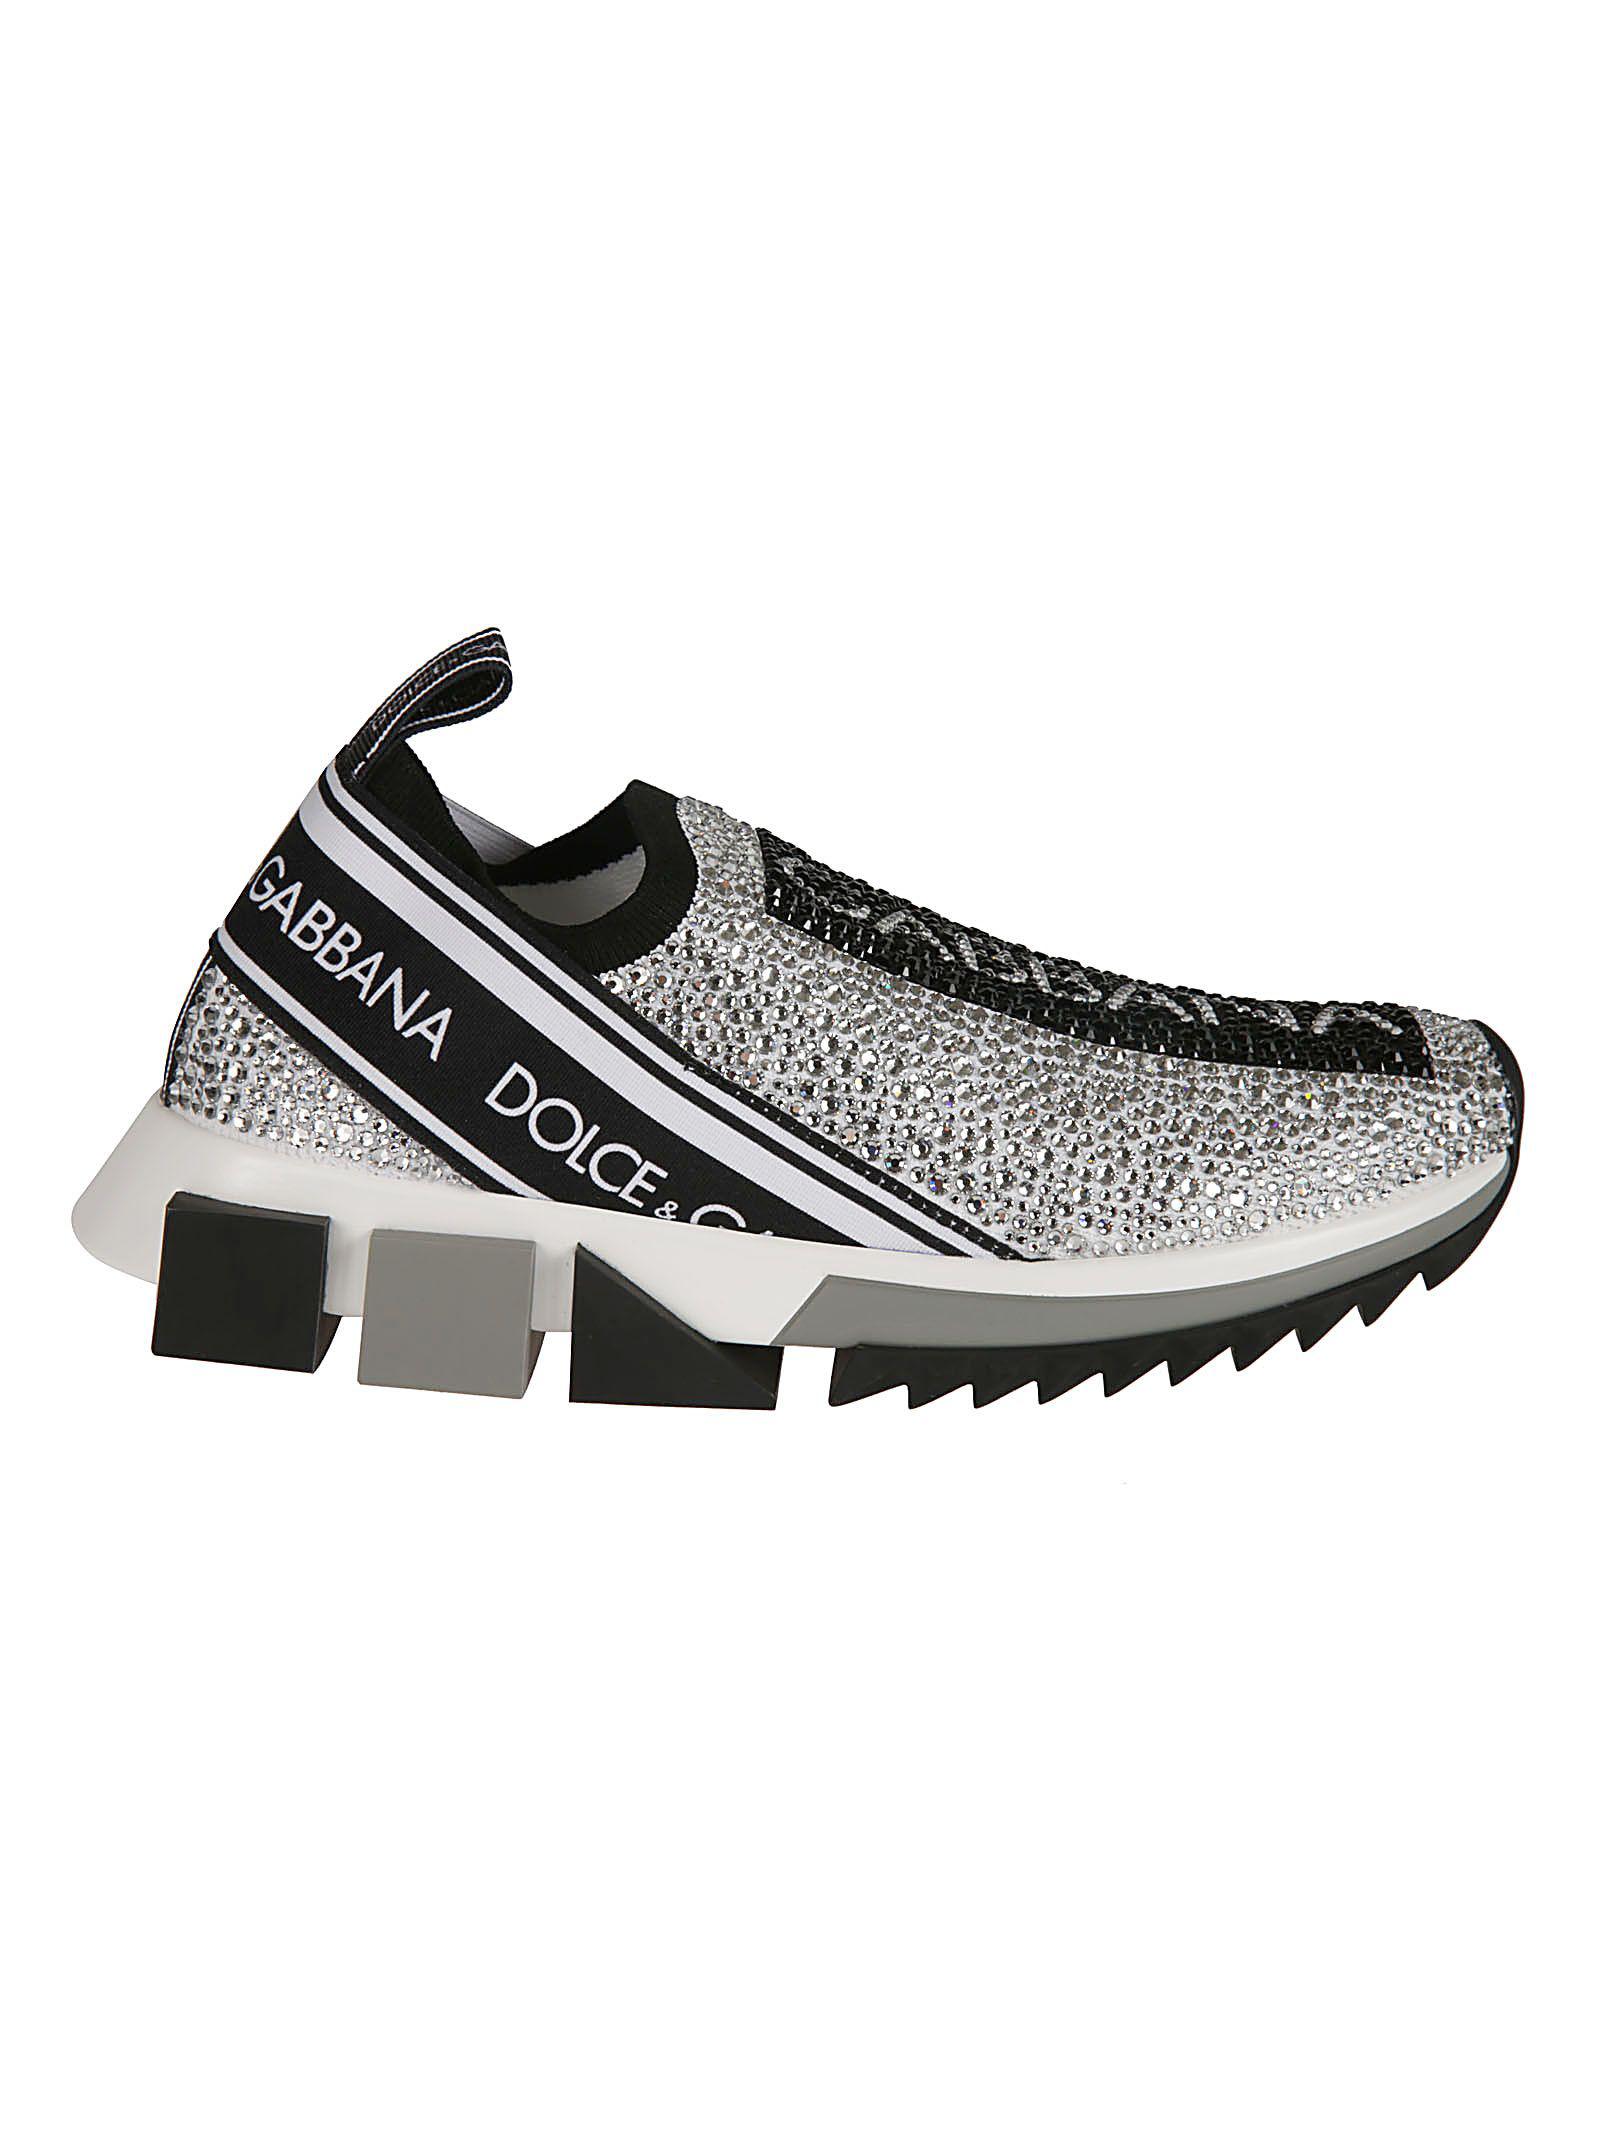 b937c046c Dolce & Gabbana Sorrento Swarovski Crystal-Embellished Logo-Print Mesh  Slip-On Sneakers